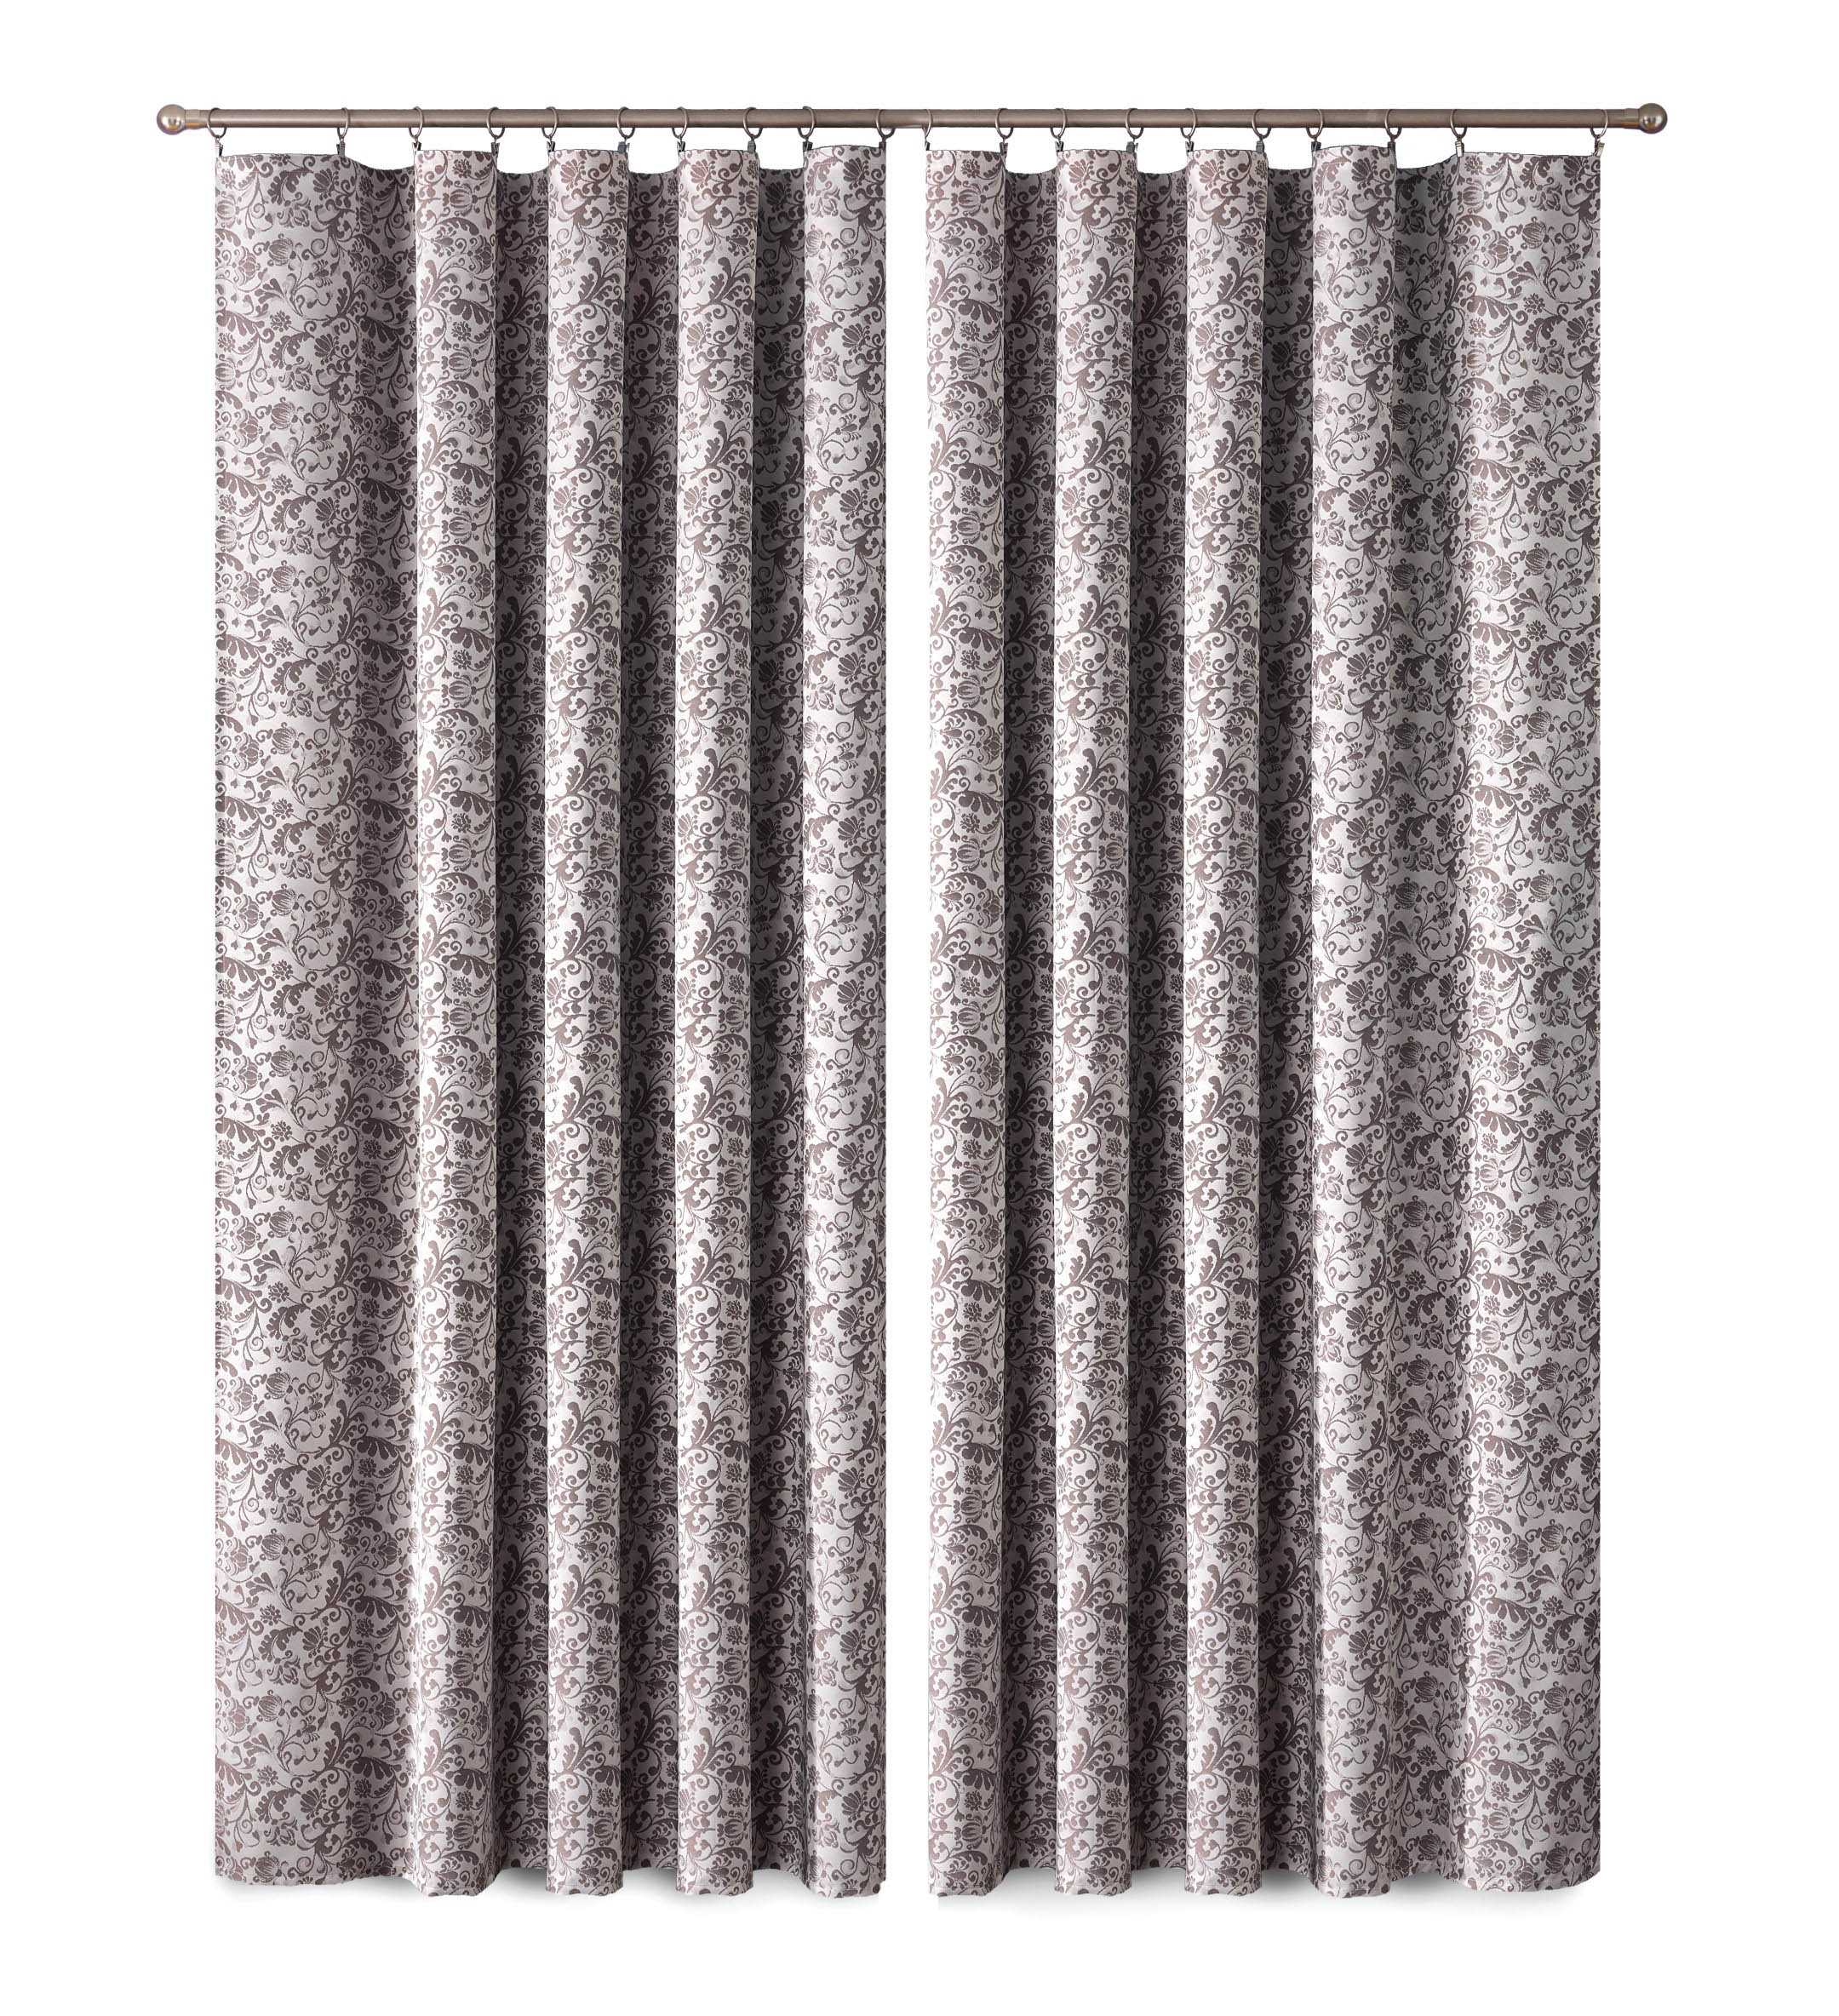 Шторы Primavera Классические шторы Posy Цвет: Коричневый шторы primavera классические шторы tilly цвет серый